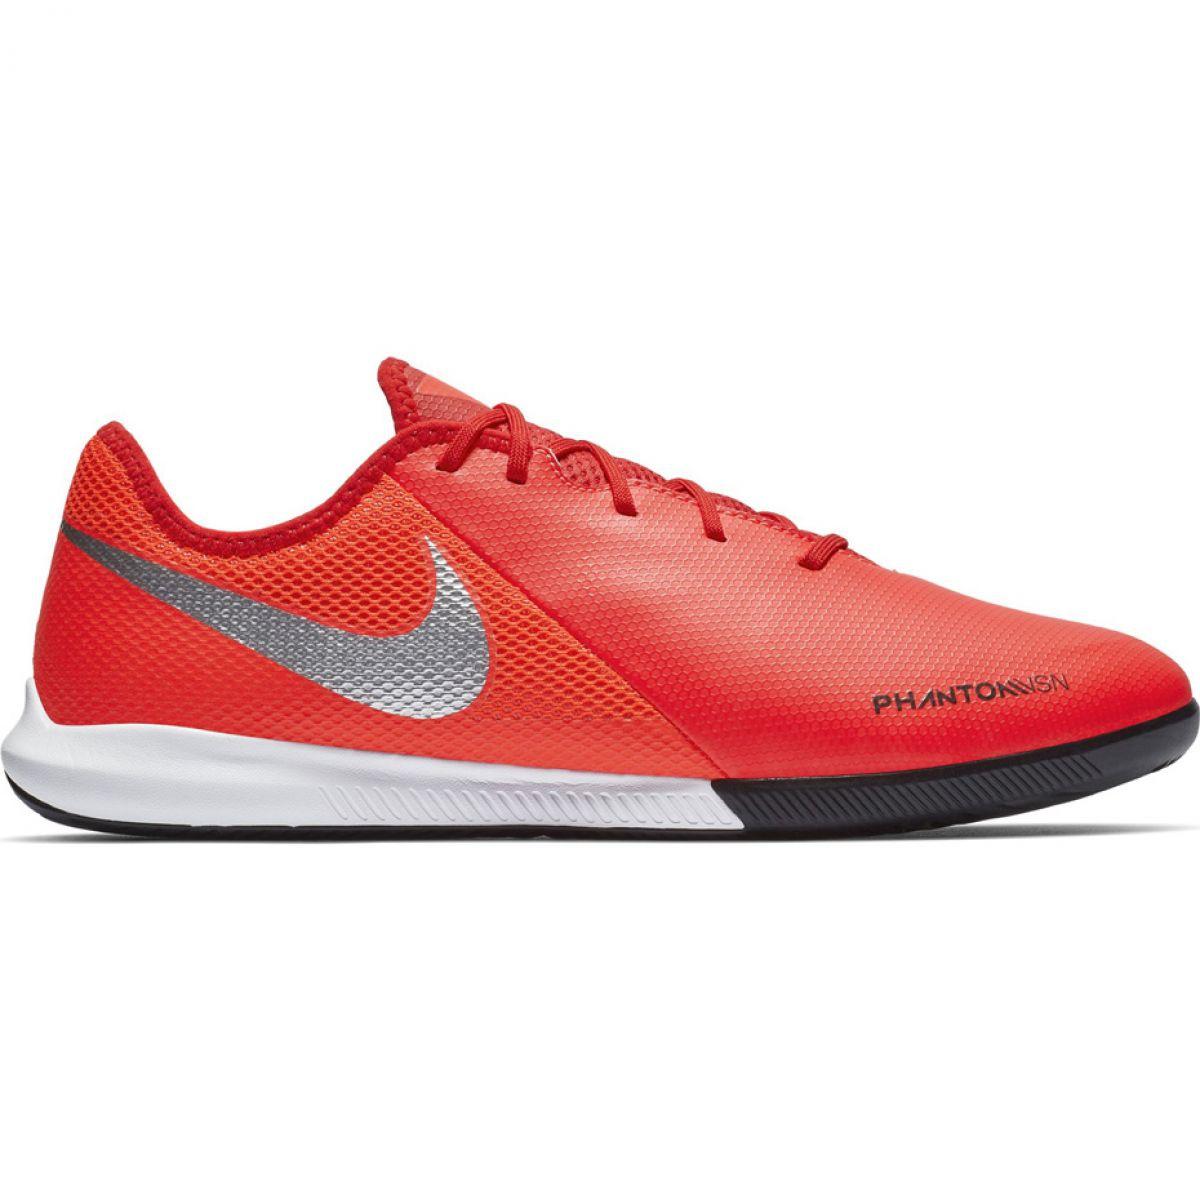 Beltéri cipő Nike Phantom Vsn Academy Ic M AO3225 600 piros piros